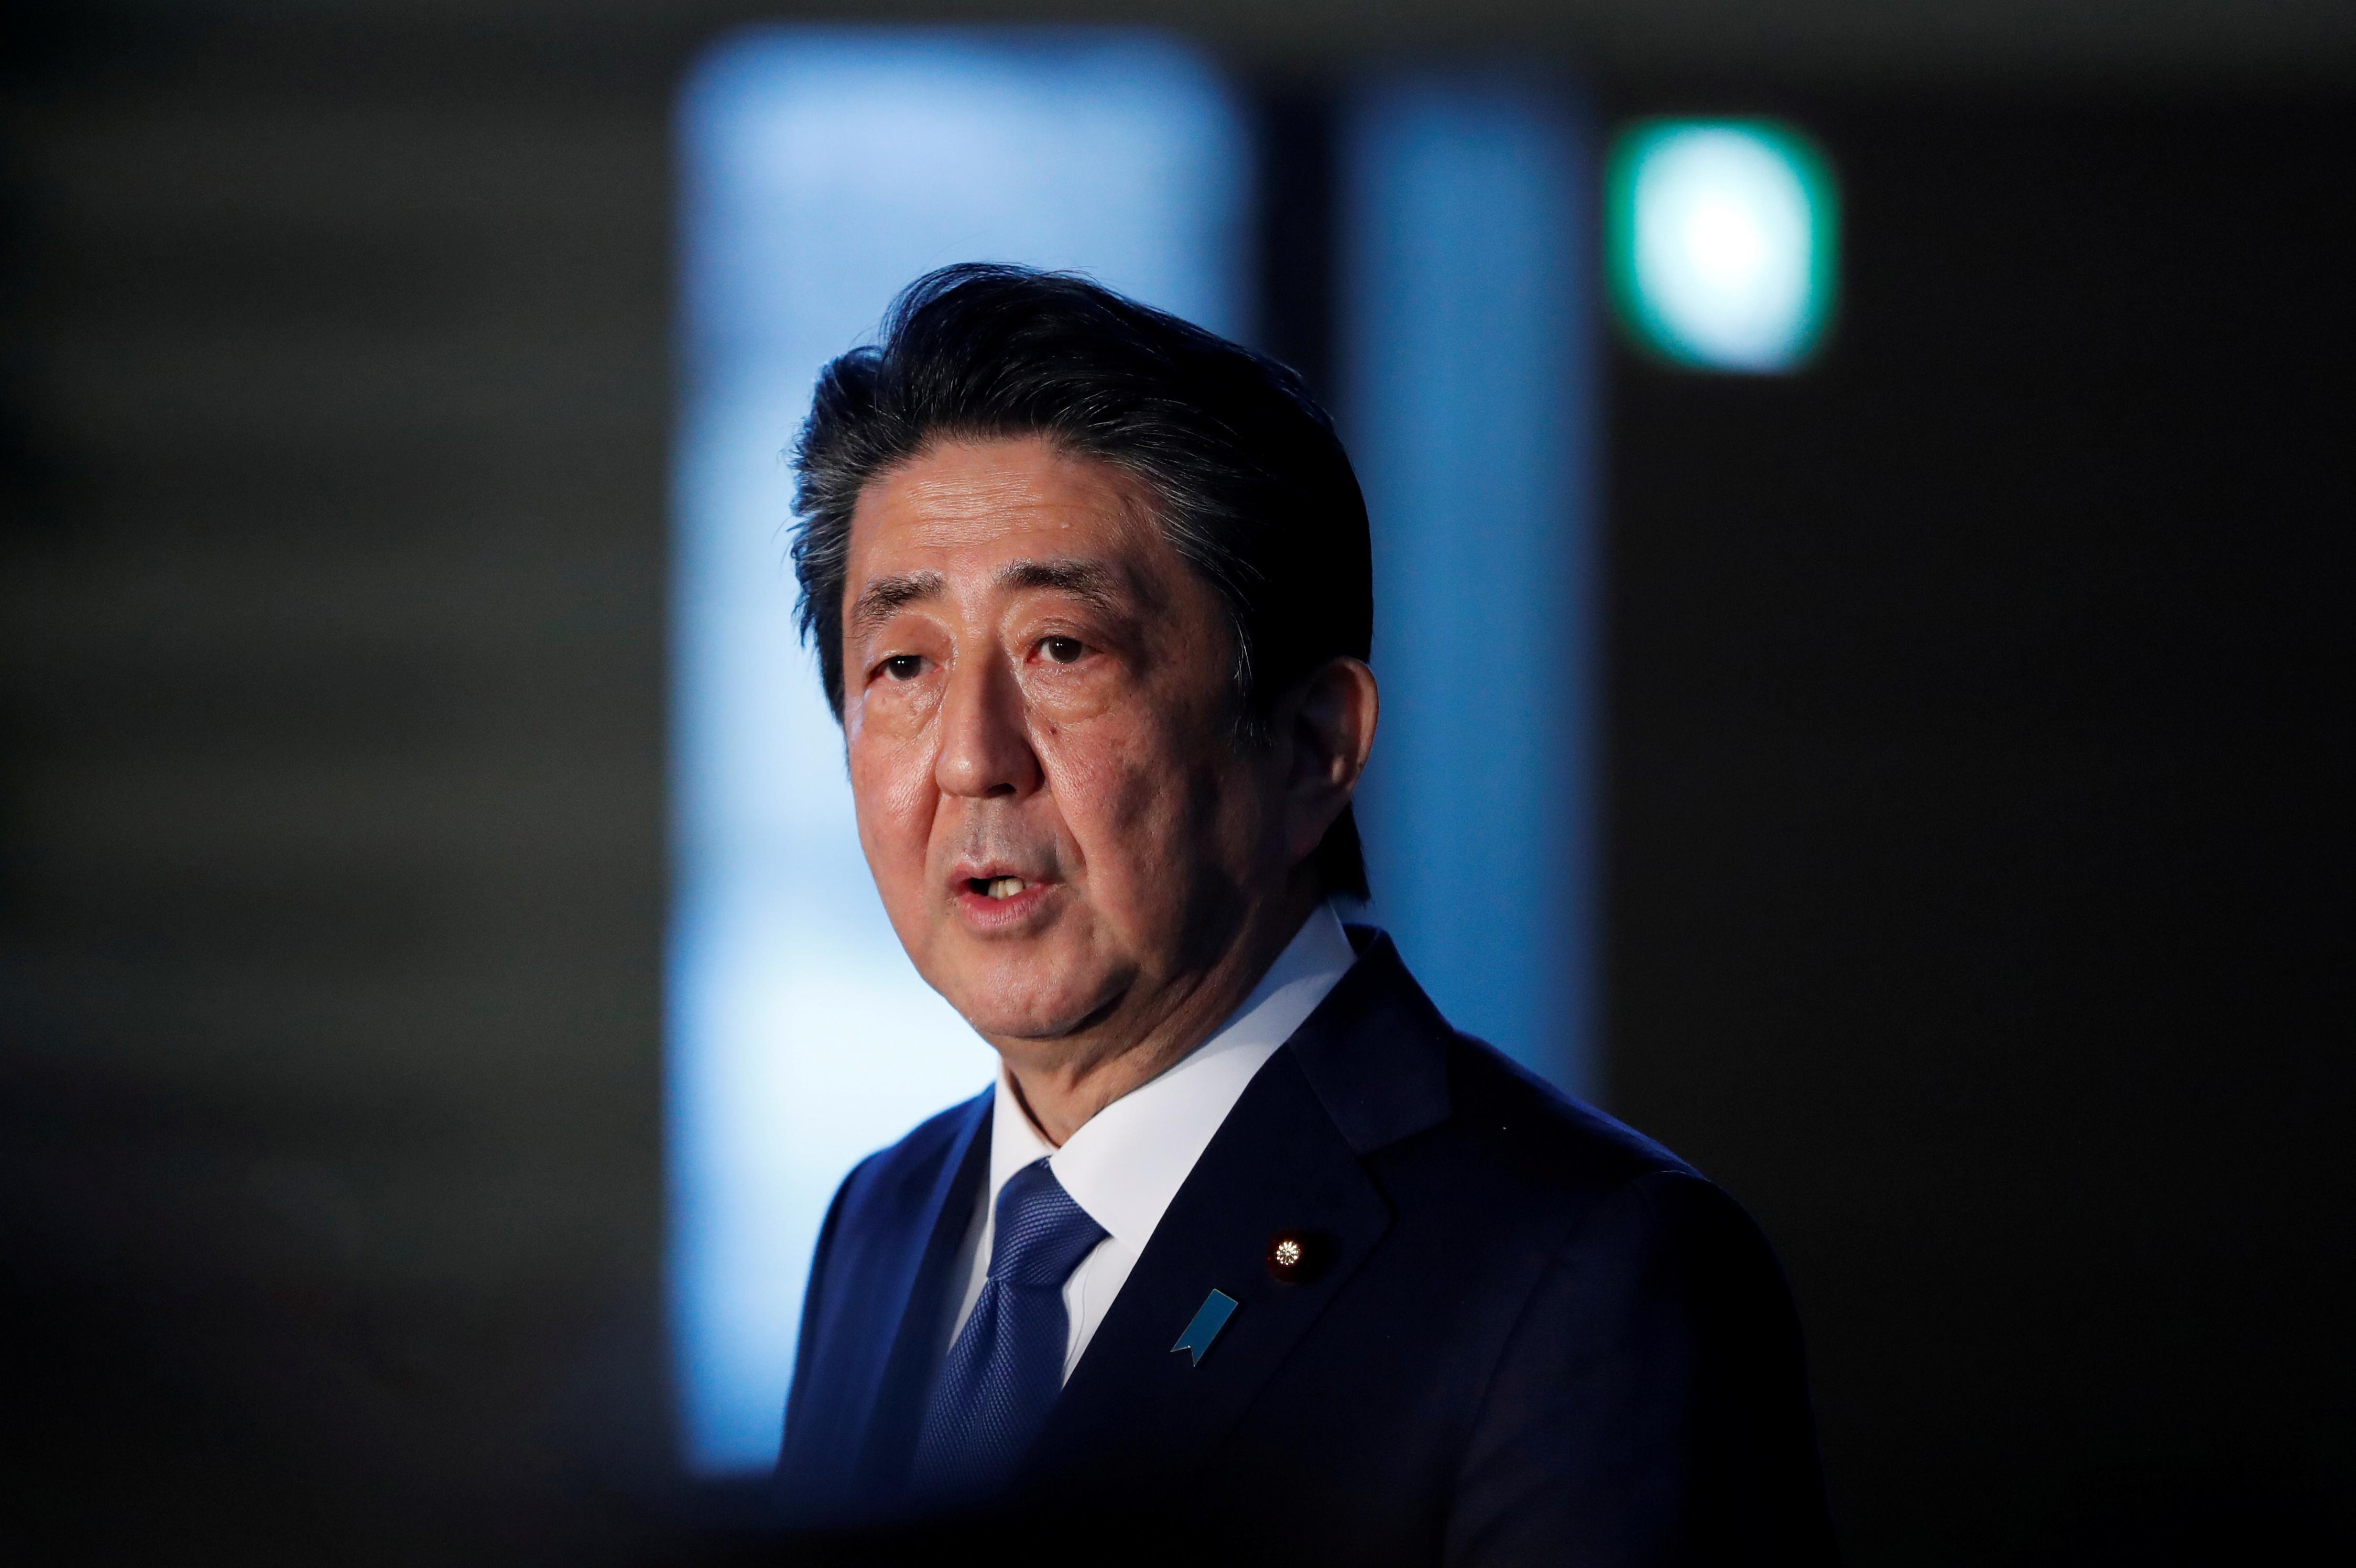 Japan to declare coronavirus emergency, launch stimulus of almost $1 trillion - PM